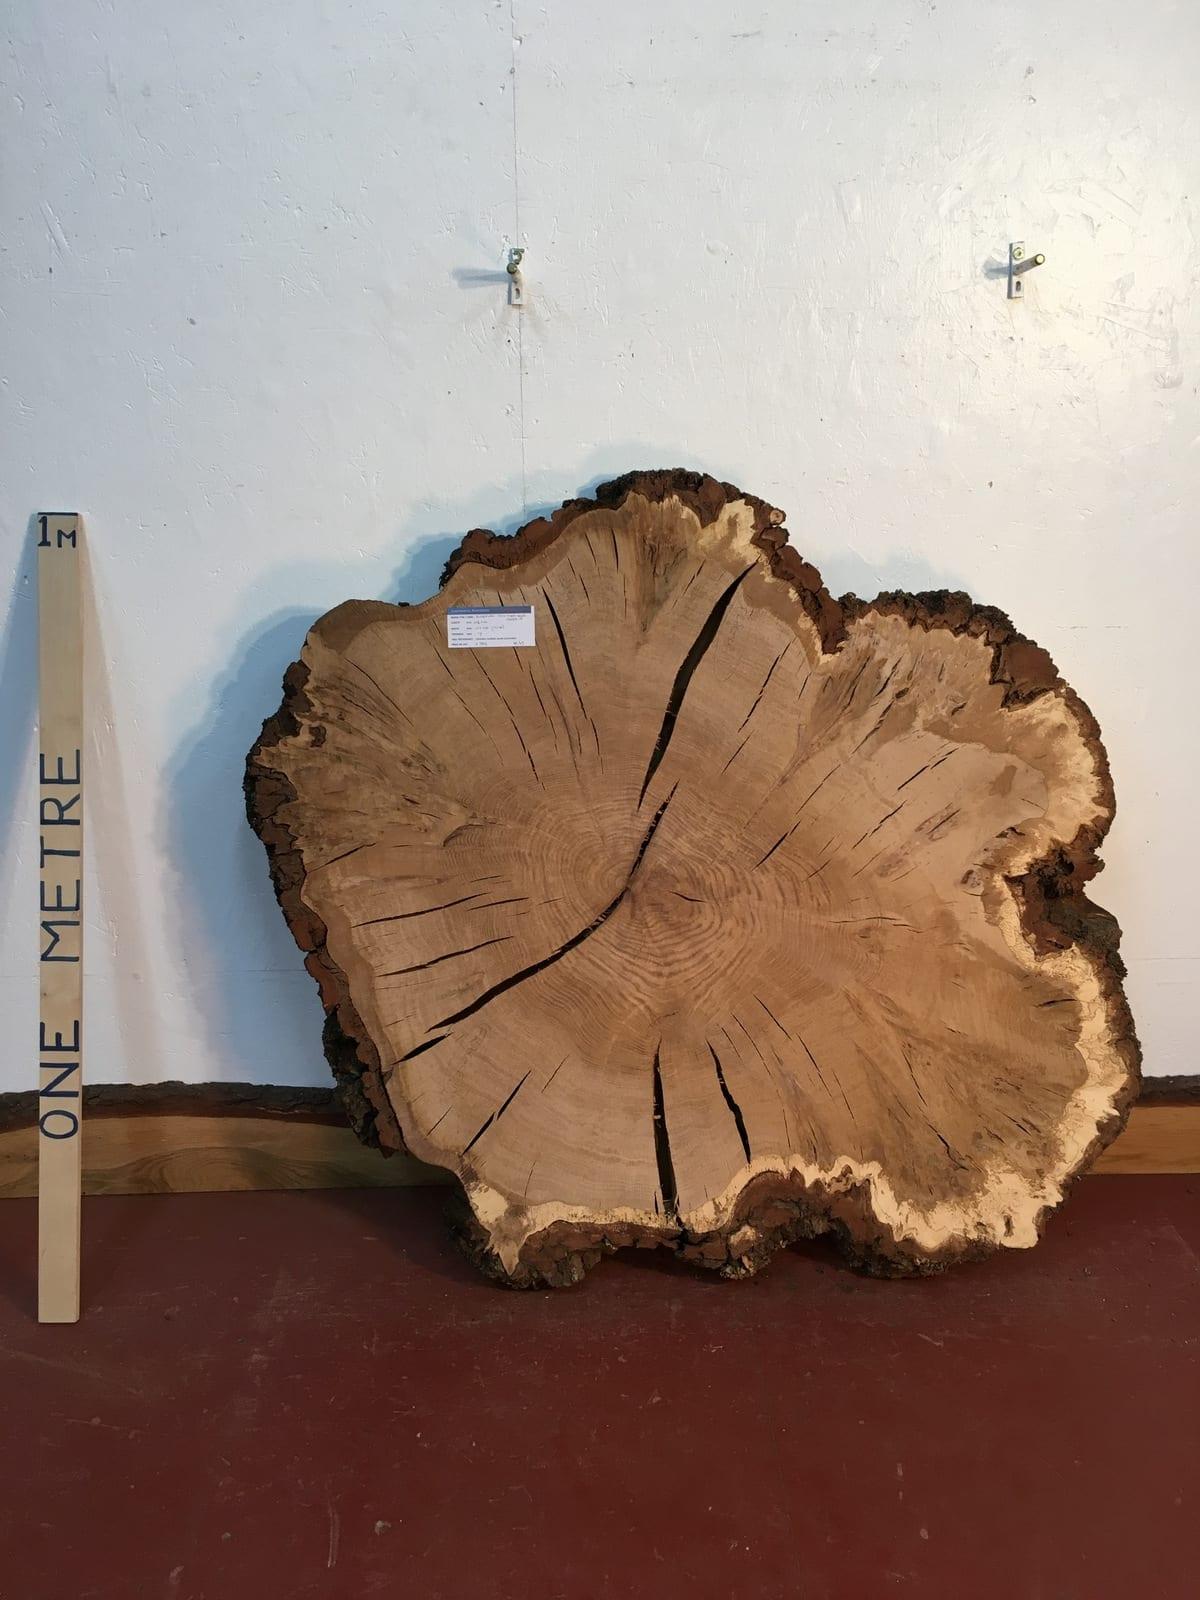 BURRY OAK TREE SLICE 1323A-9 Natural Waney Live Edge Slab Board Thickness 7cm Kiln Dried Planed Seasoned Hardwood Wildwood Coffee Table Top